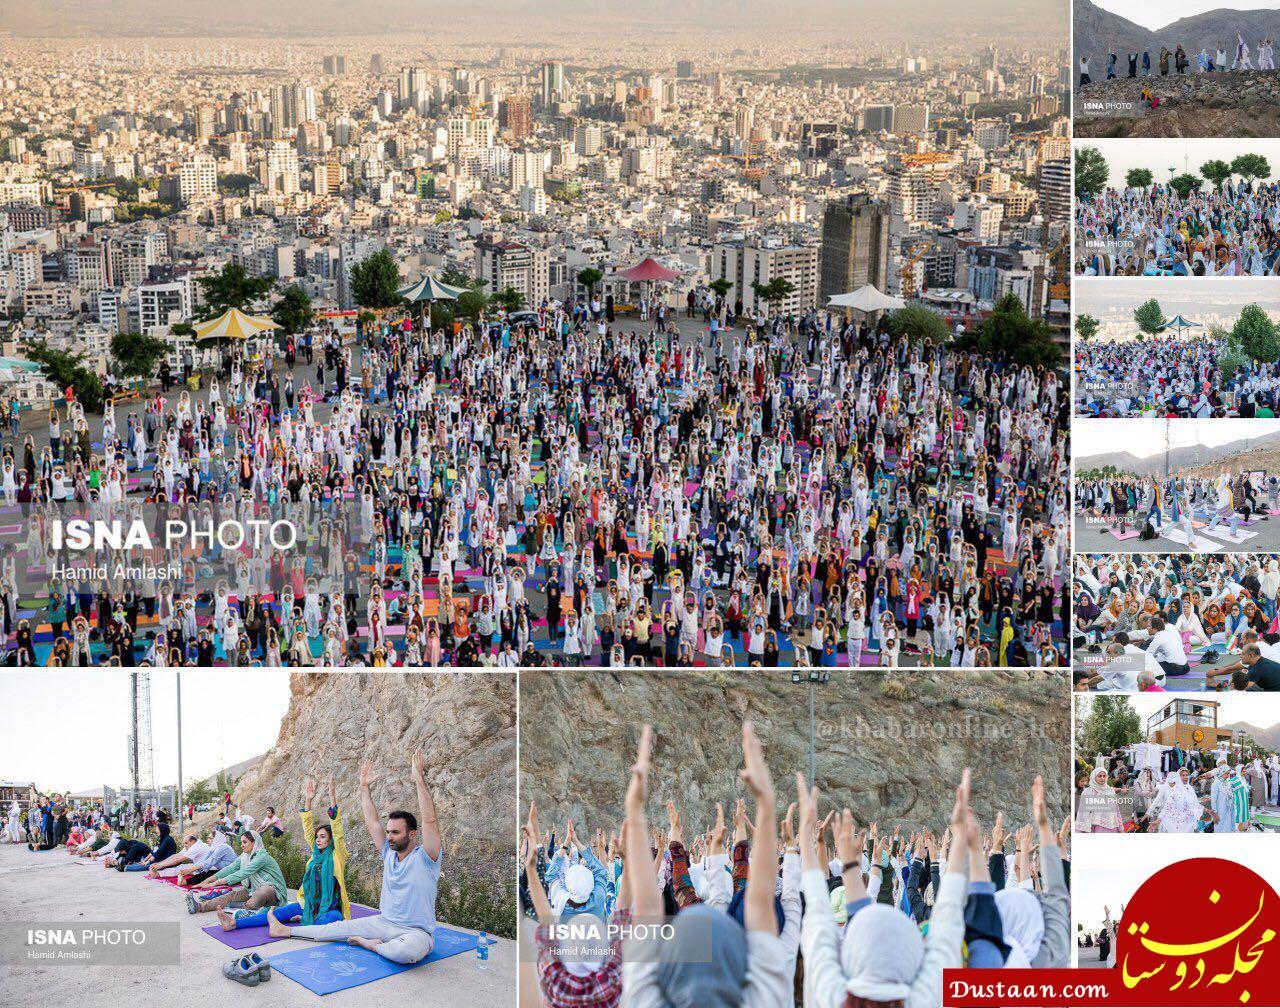 www.dustaan.com یوگا در مرتفع ترین نقطه تهران/ زنان و مردان تهرانی در کنار هم +عکس